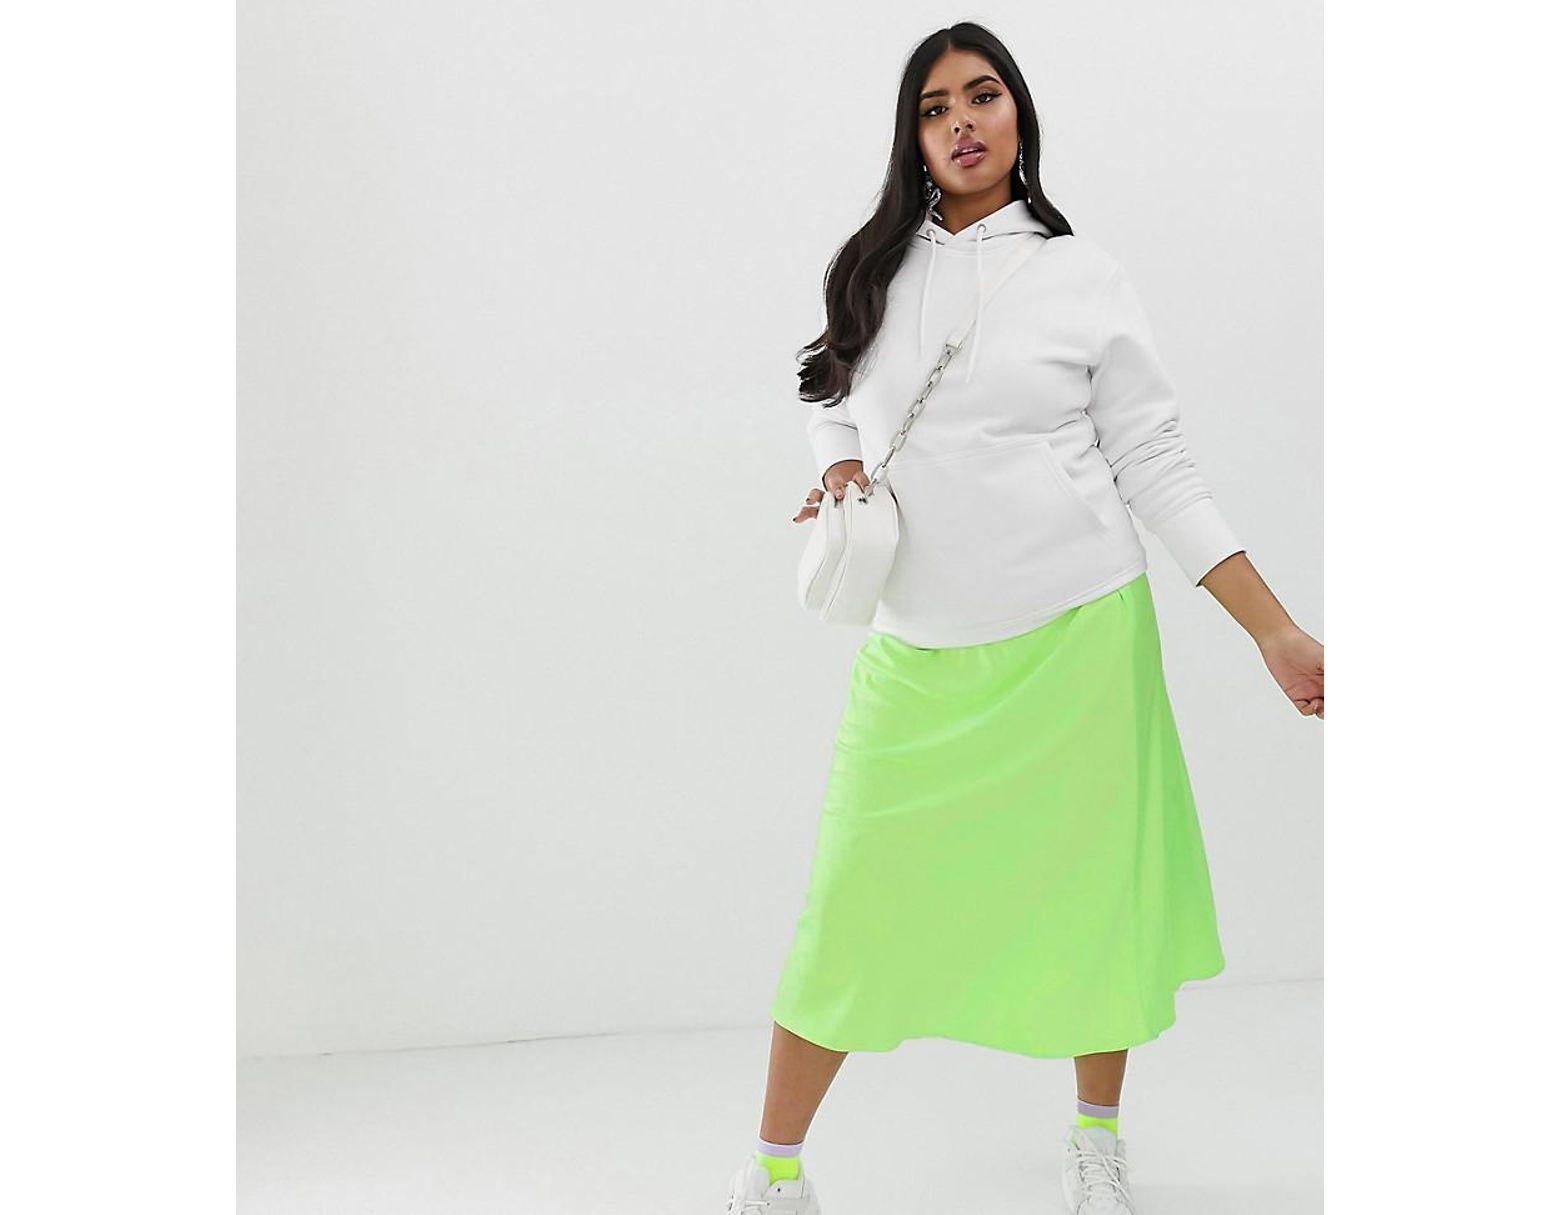 a393072c7b08 ASOS Asos Design Curve Bias Cut Satin Slip Midi Skirt In Neon in Green -  Lyst